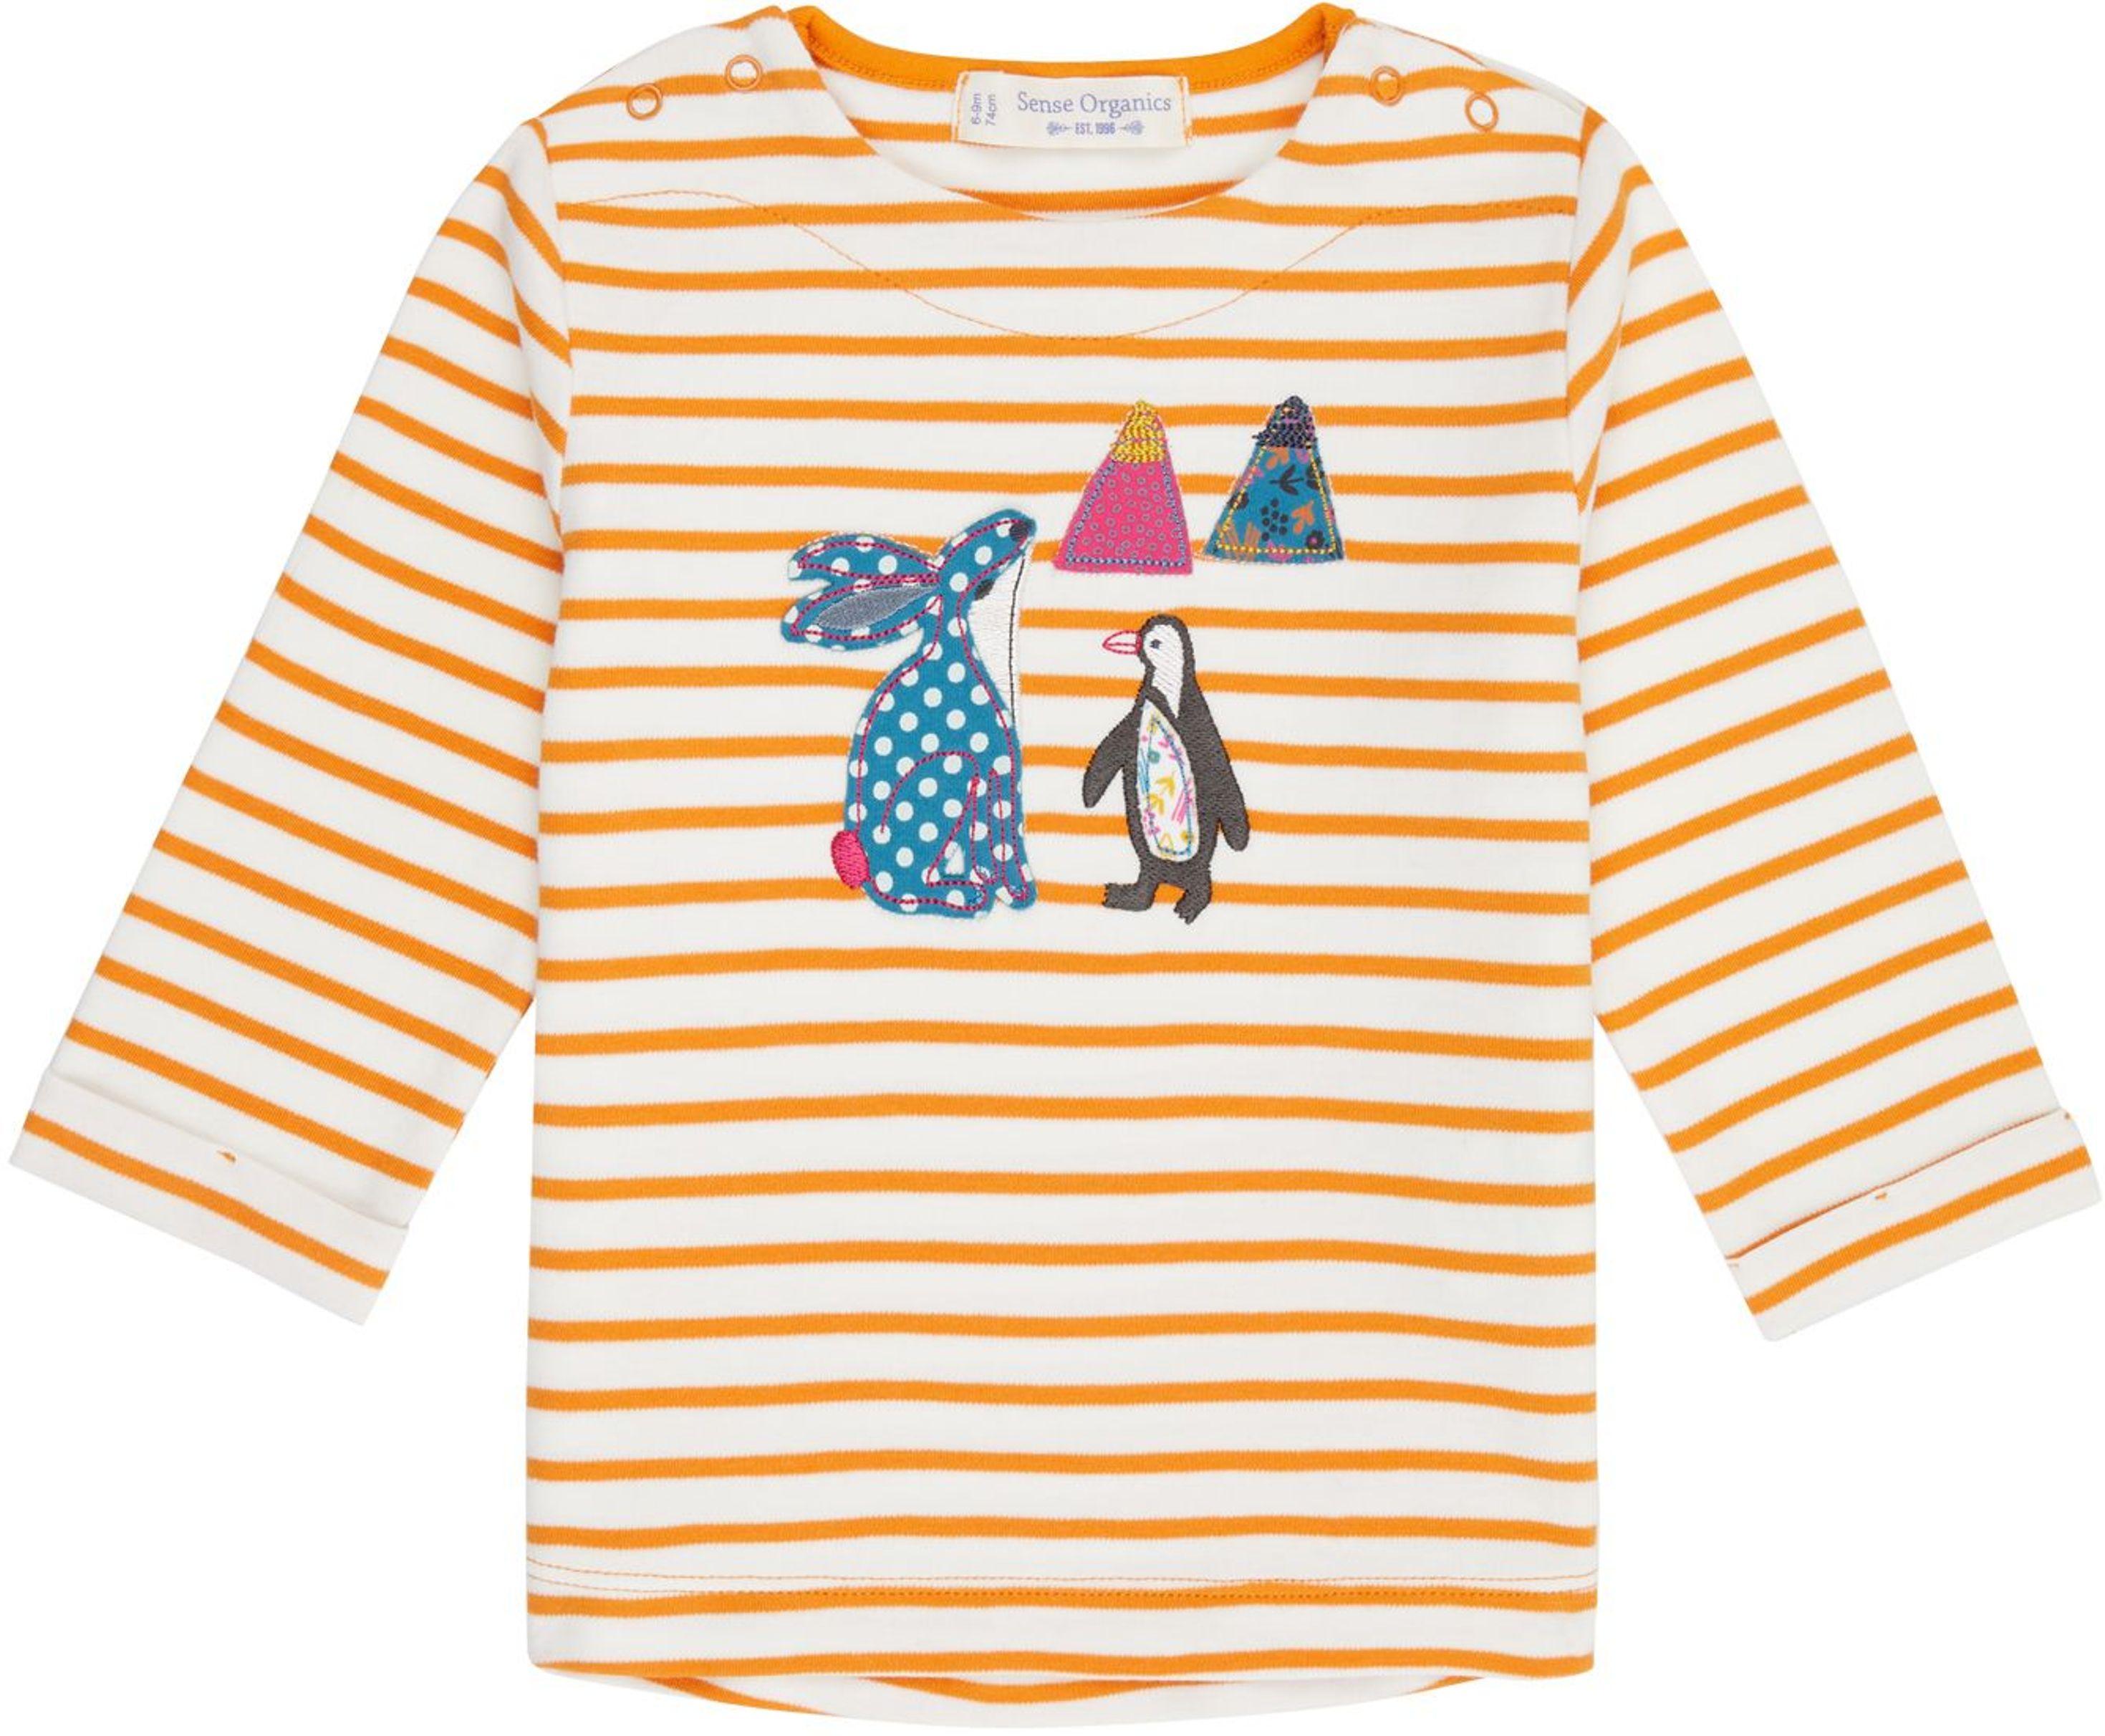 Sense Organic LEJA Baby Shirt L/S cheddar stripes